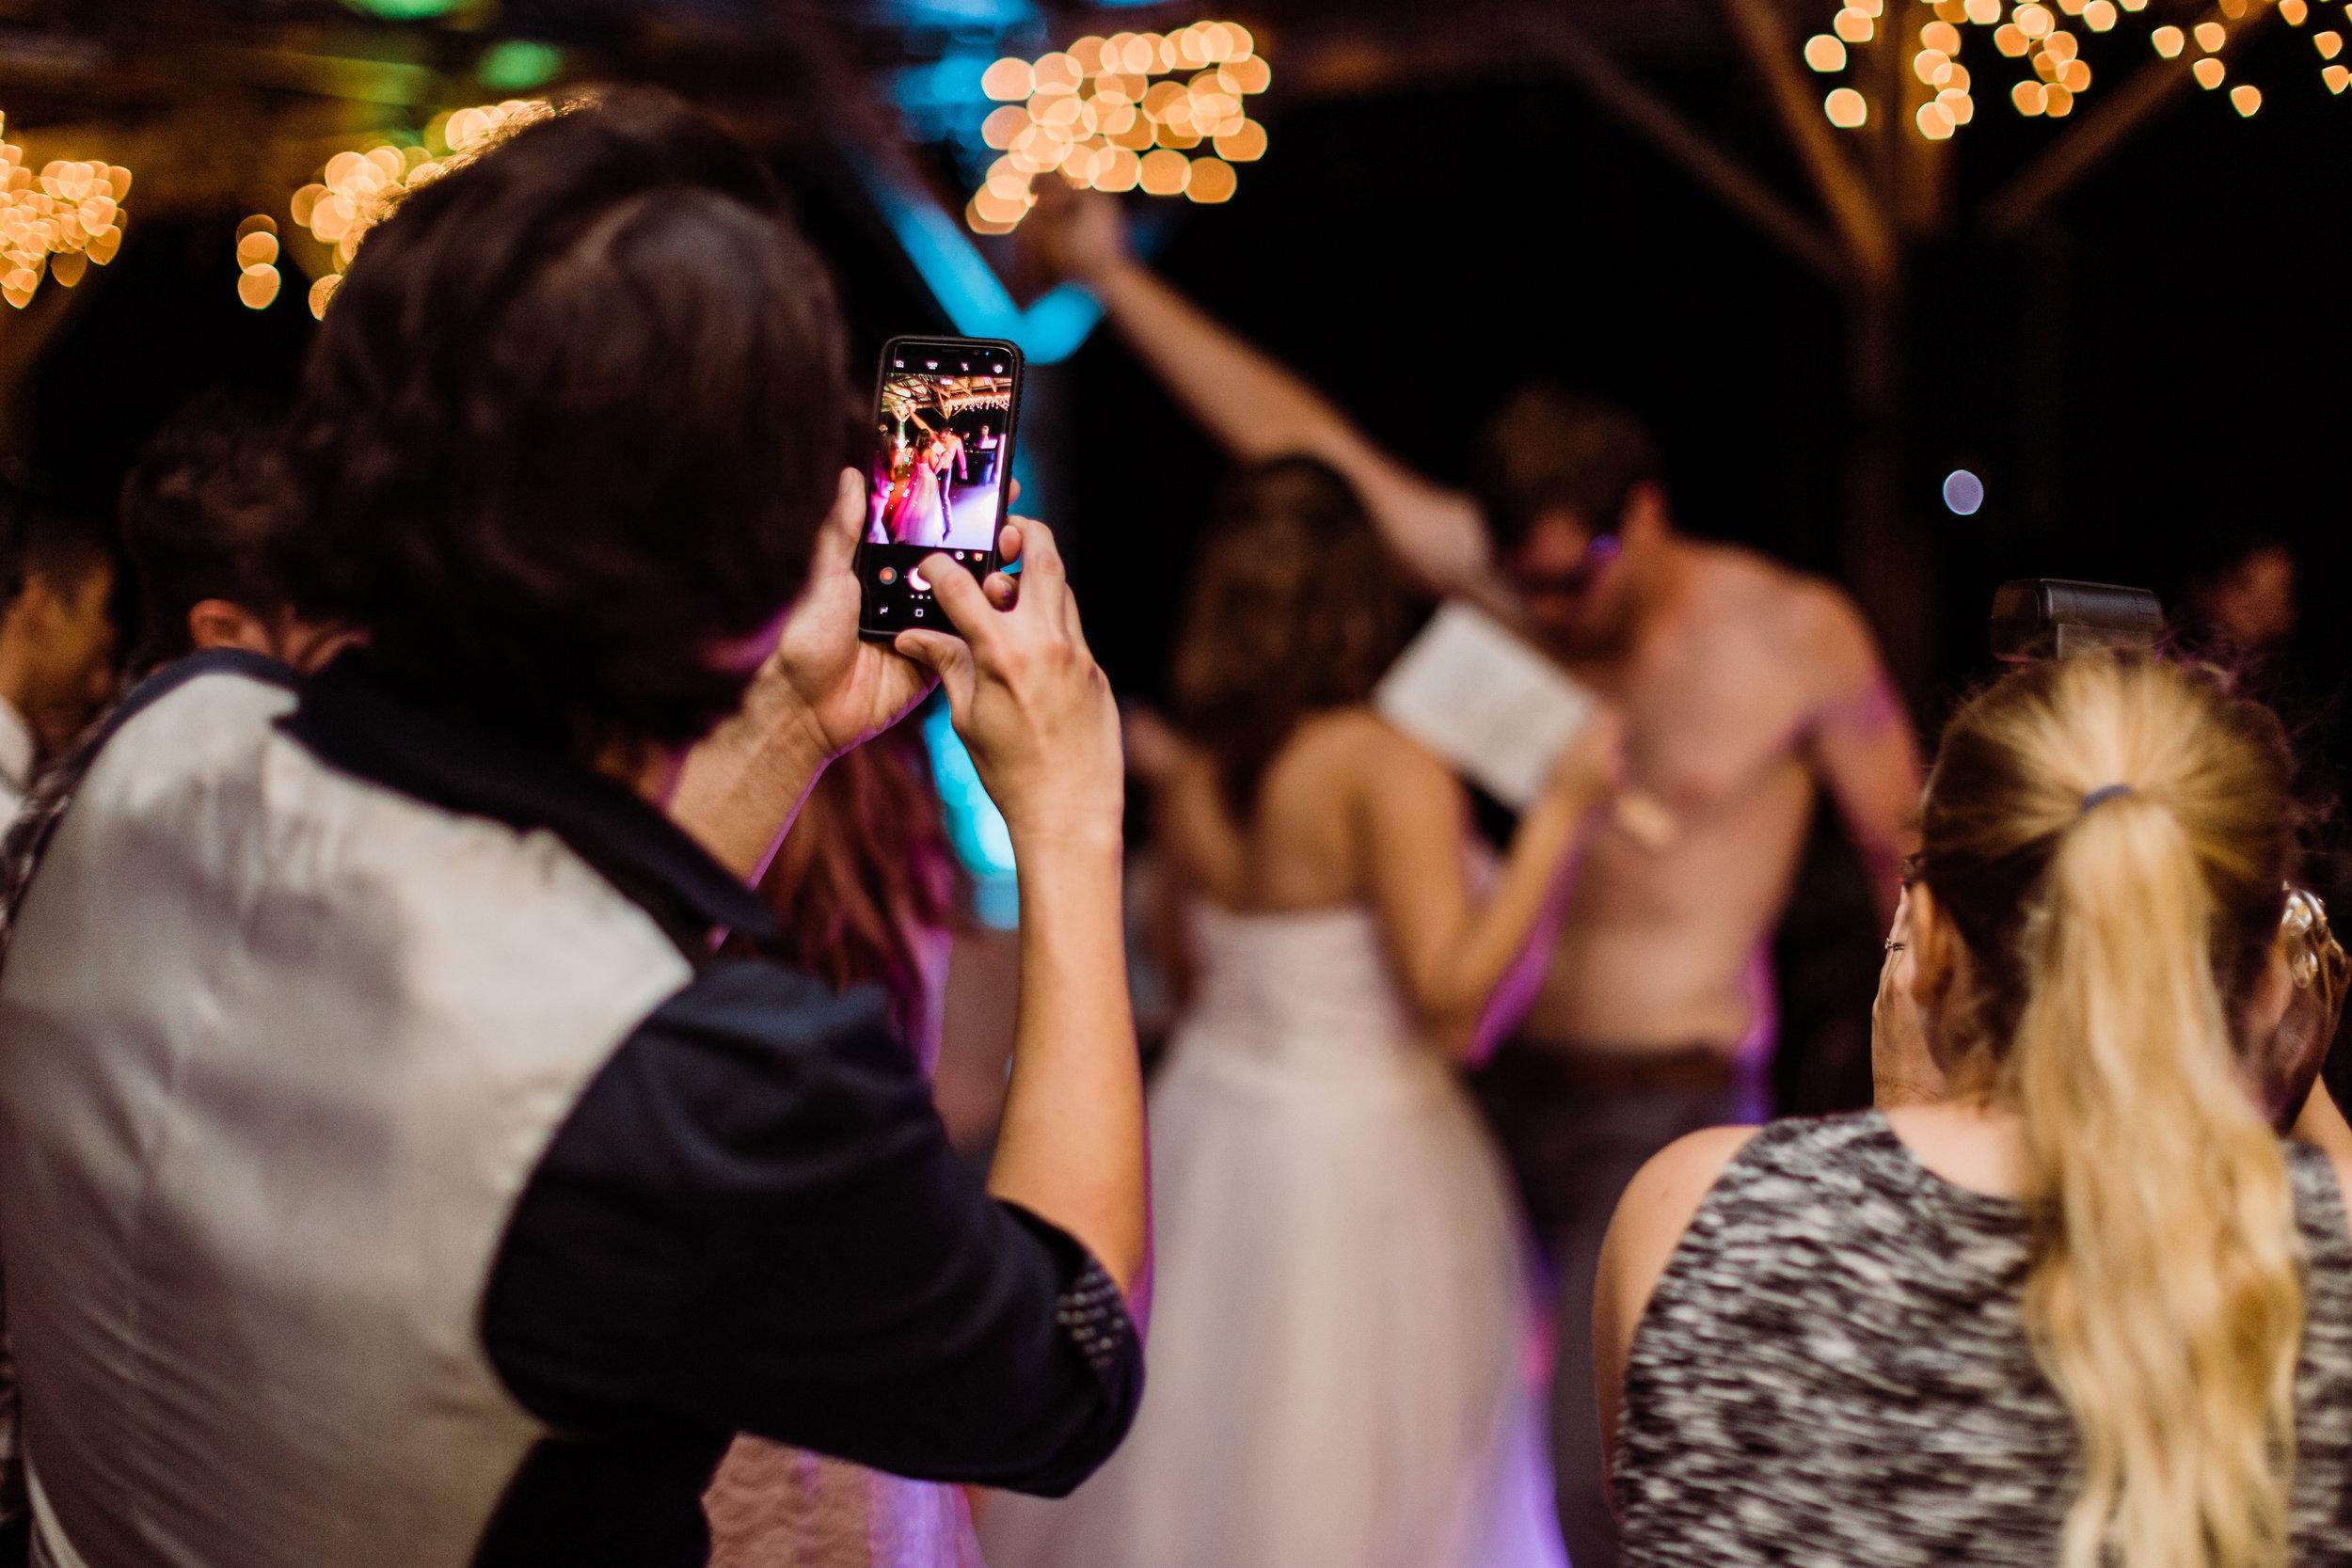 2017.10.14 Samantha and Matthew Crabtree Sarasota Wedding (681 of 708).jpg